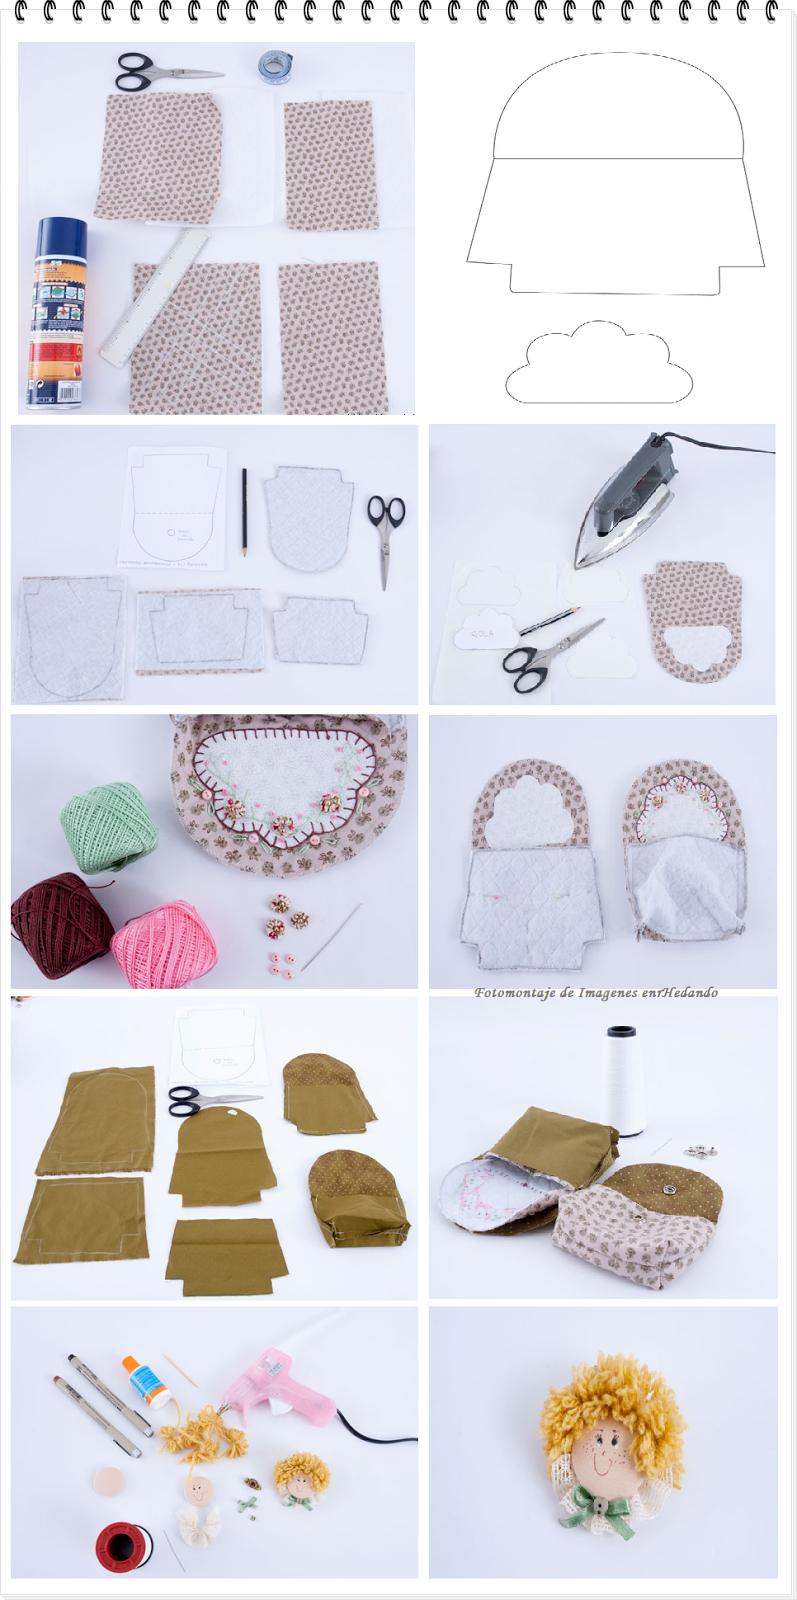 monederos, infantiles, muñecas, labores, costura, diys, manualidades